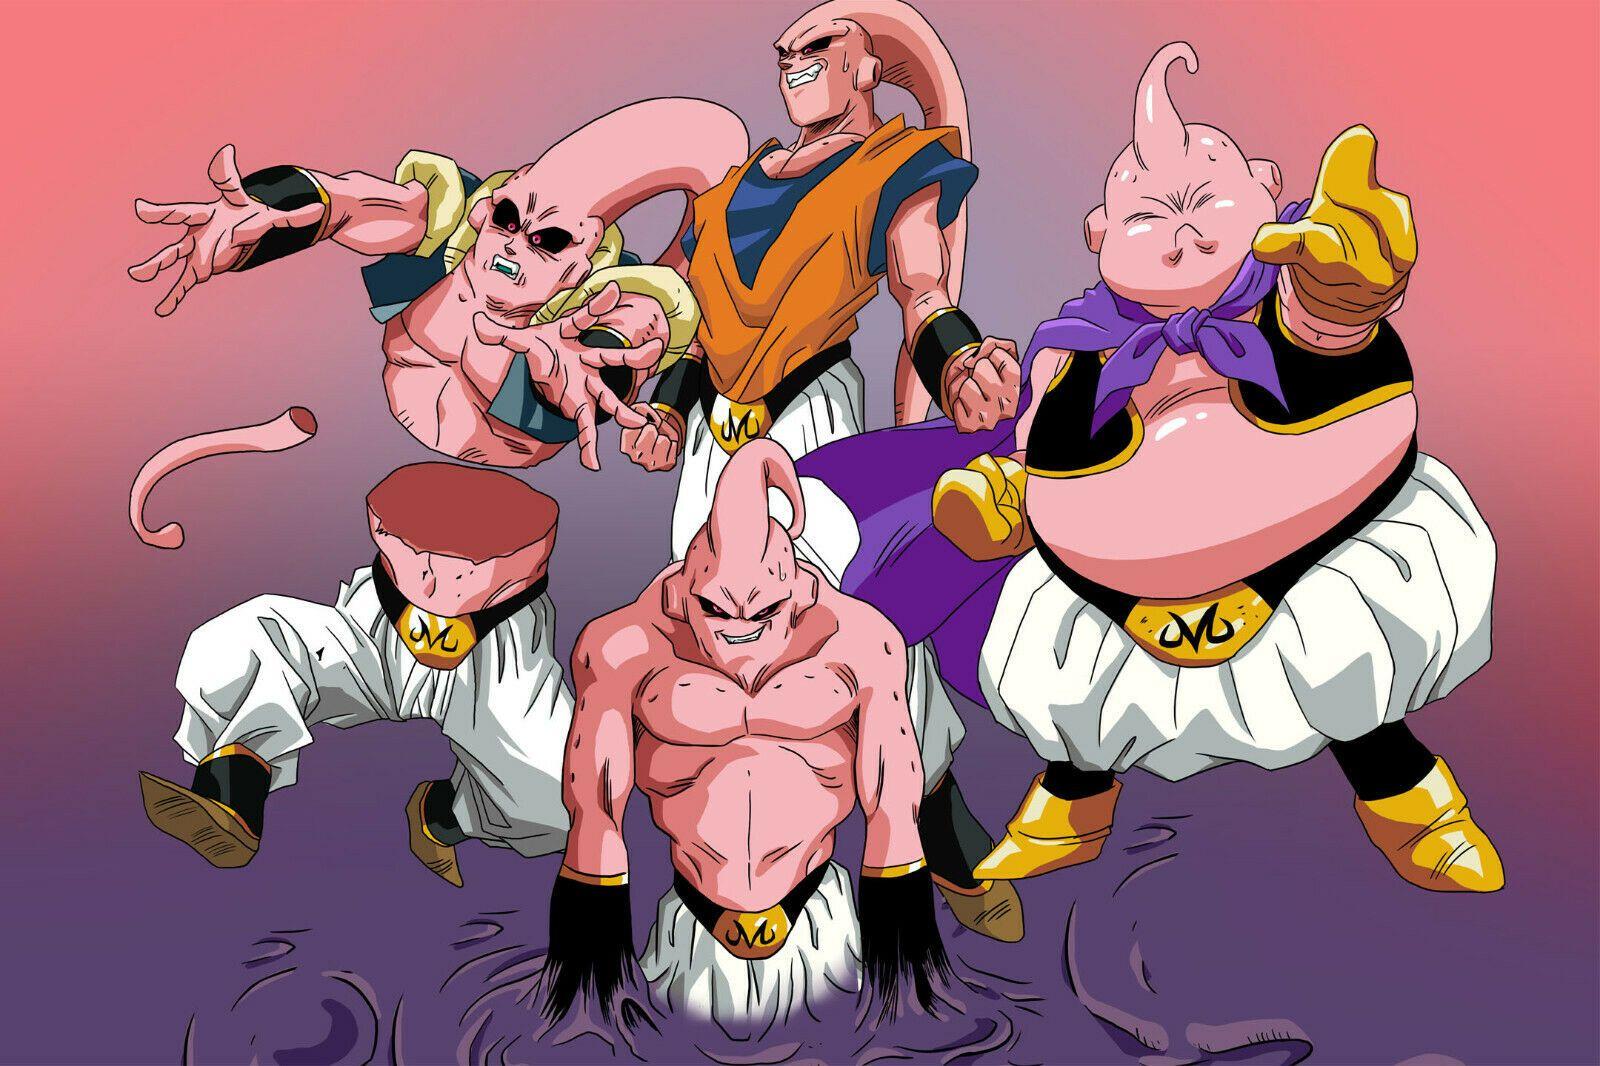 Dragon Ball Z Poster Majin Boo 4 Forms 12in X 18in Free Shipping Dragon Ball Anime Dragon Ball Dragon Ball Super Goku